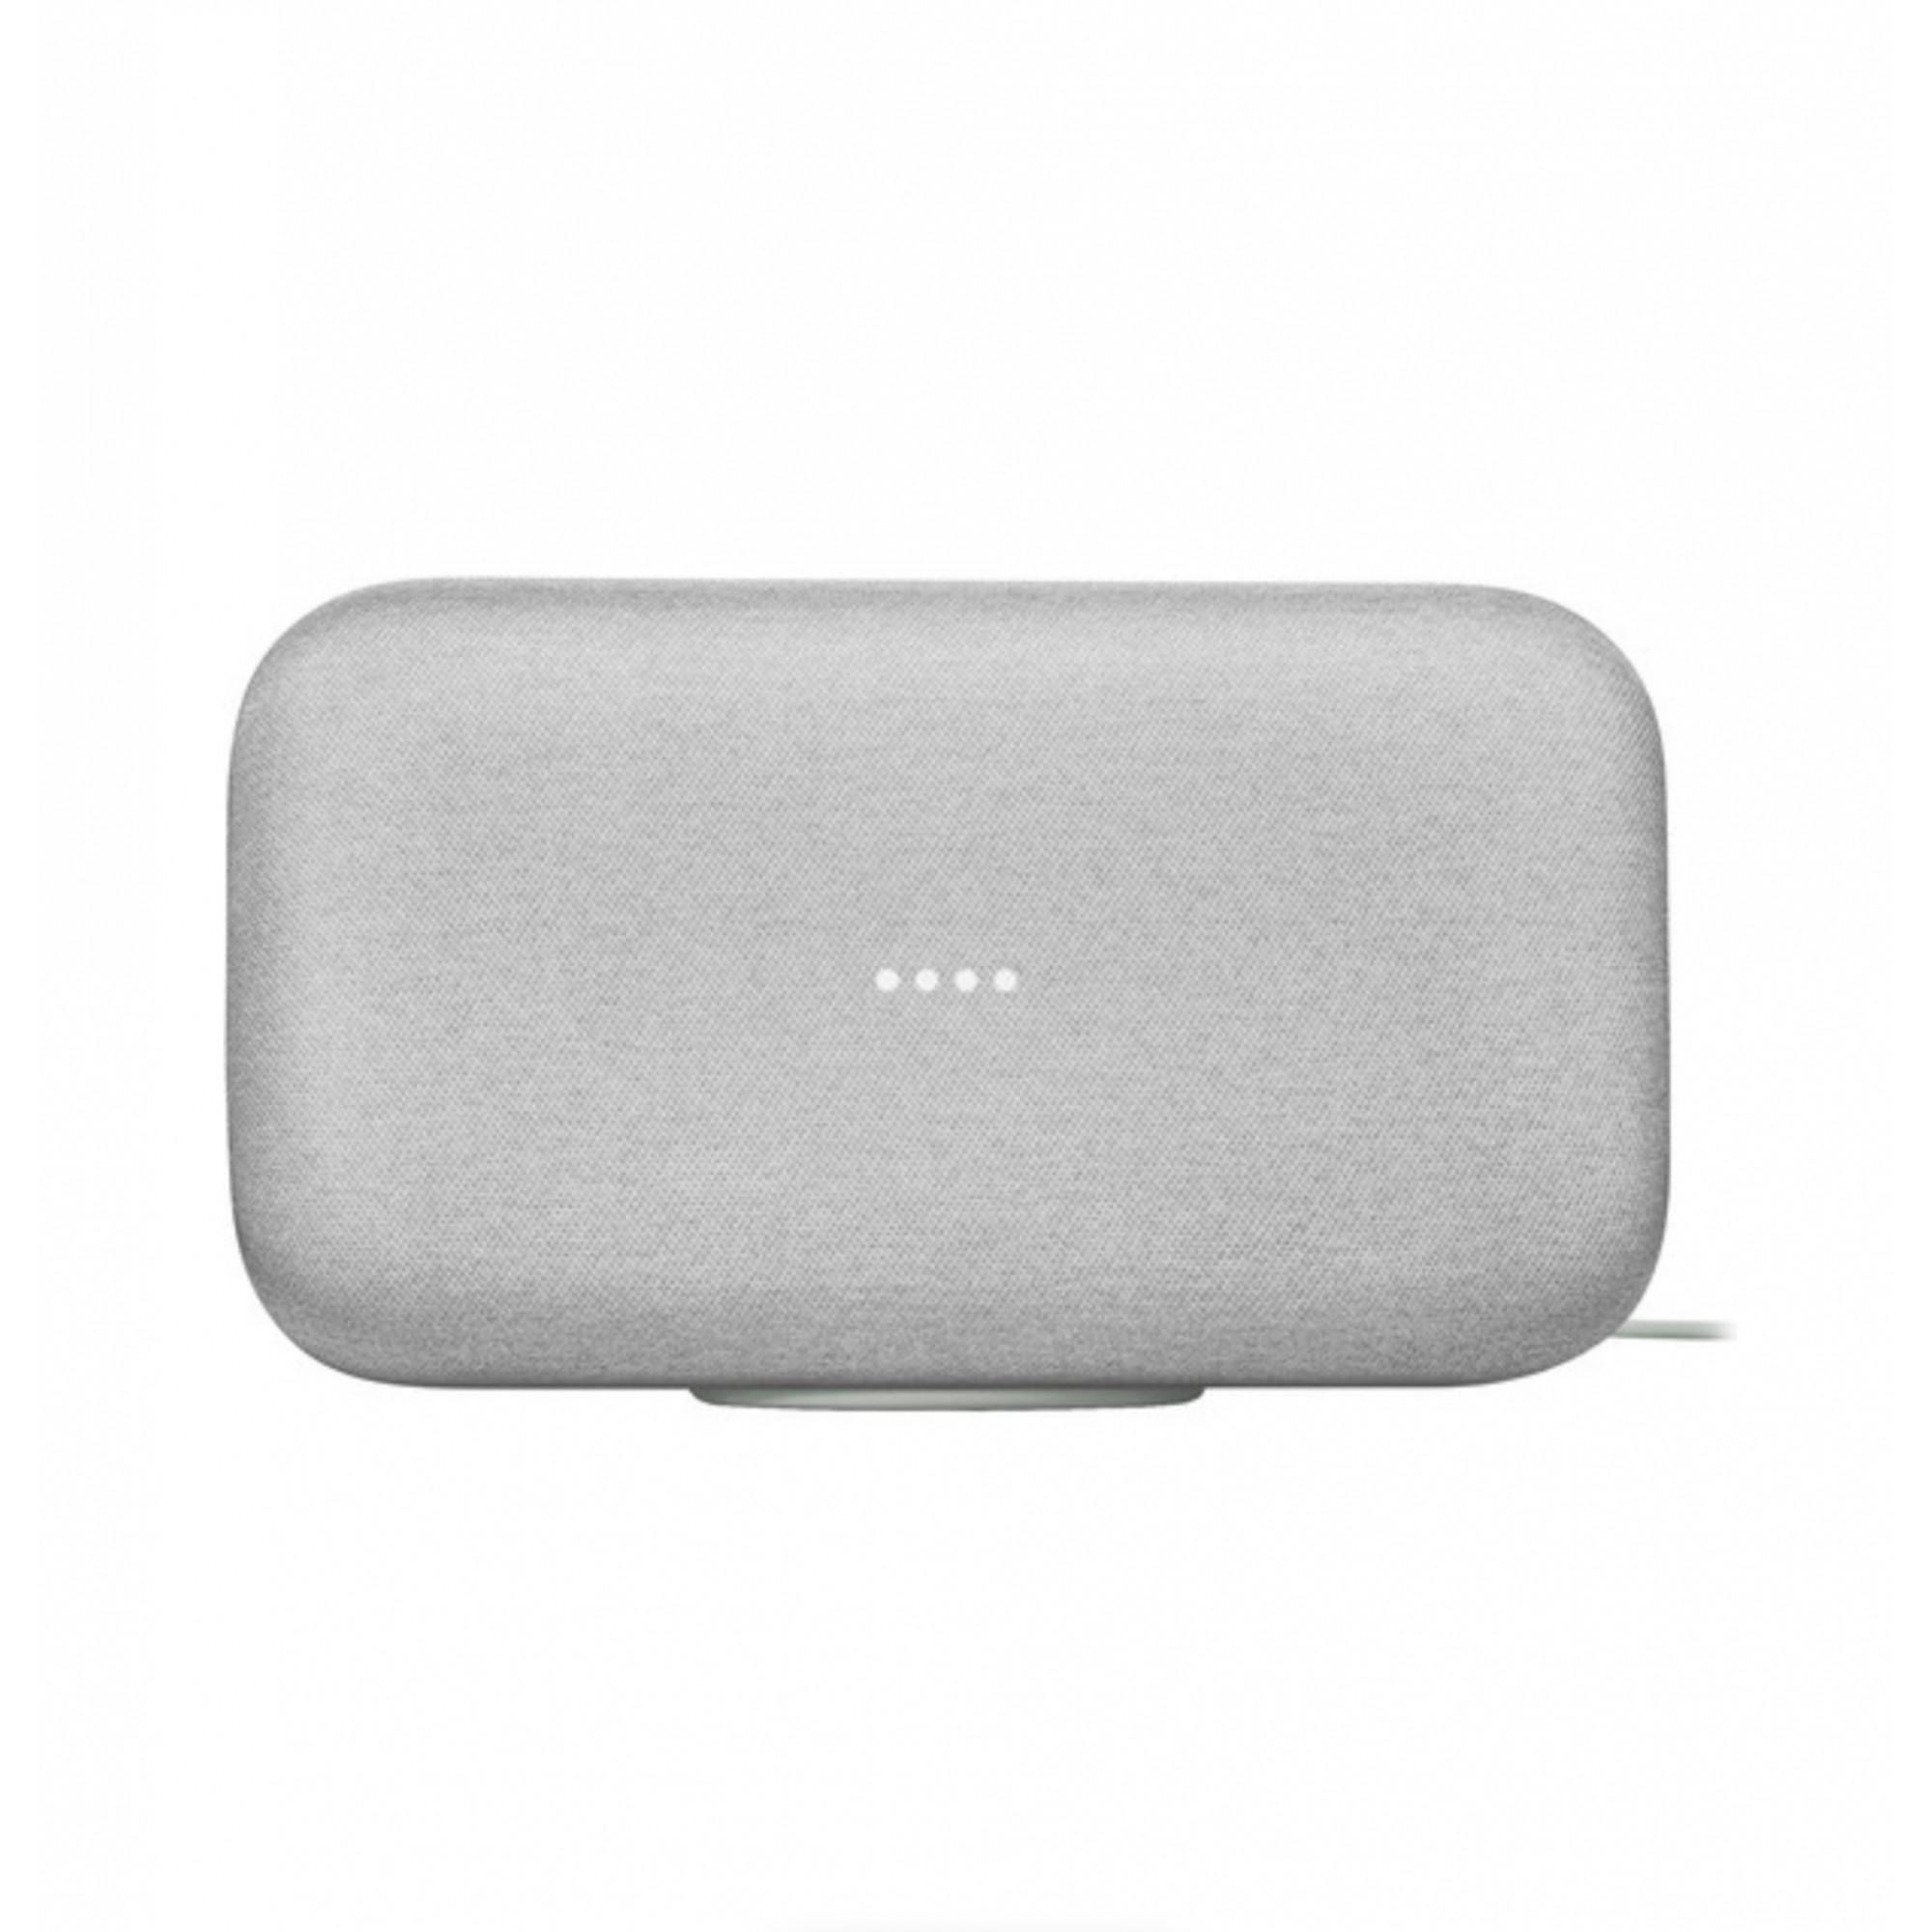 Google Home Max ( CHALK ) GA00222-US